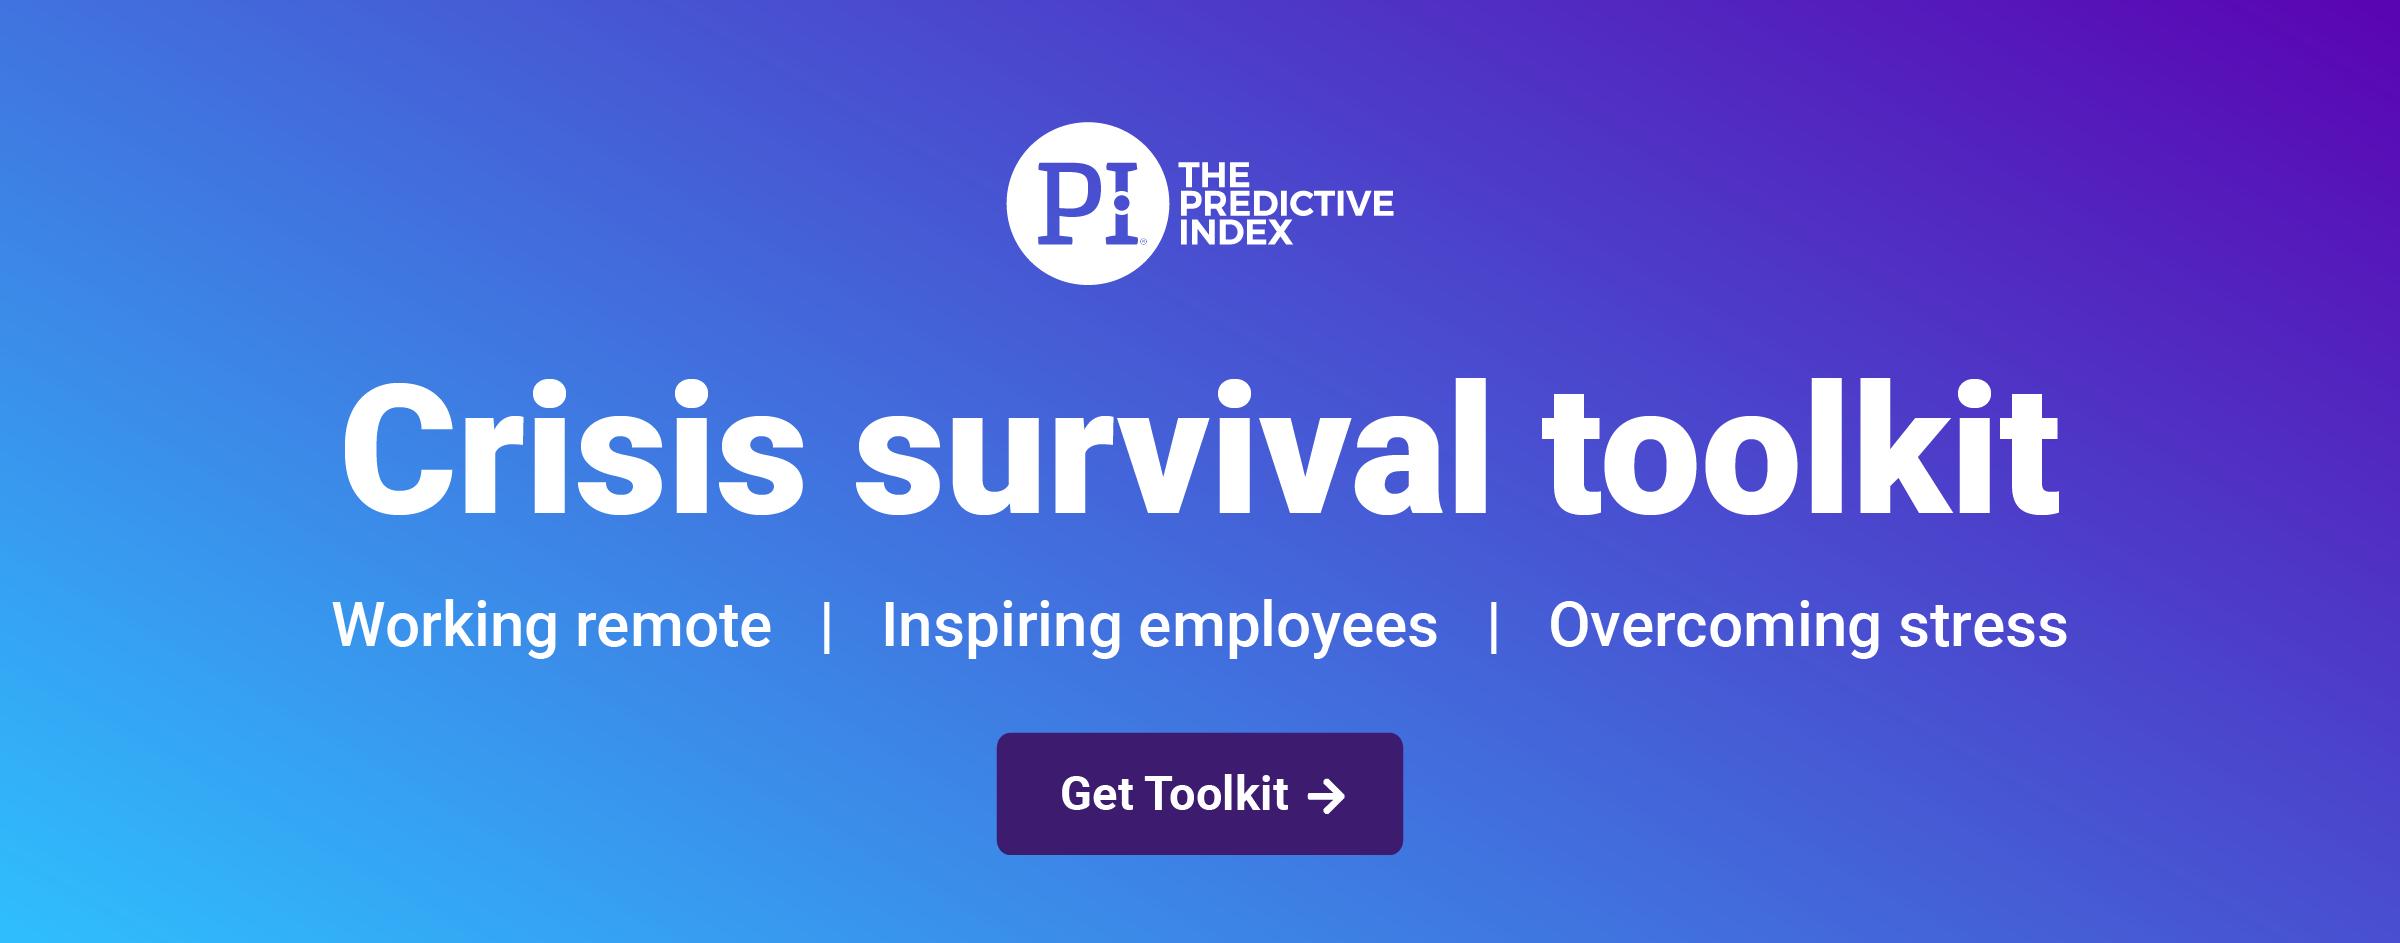 PI Crisis Survival Toolkit banner